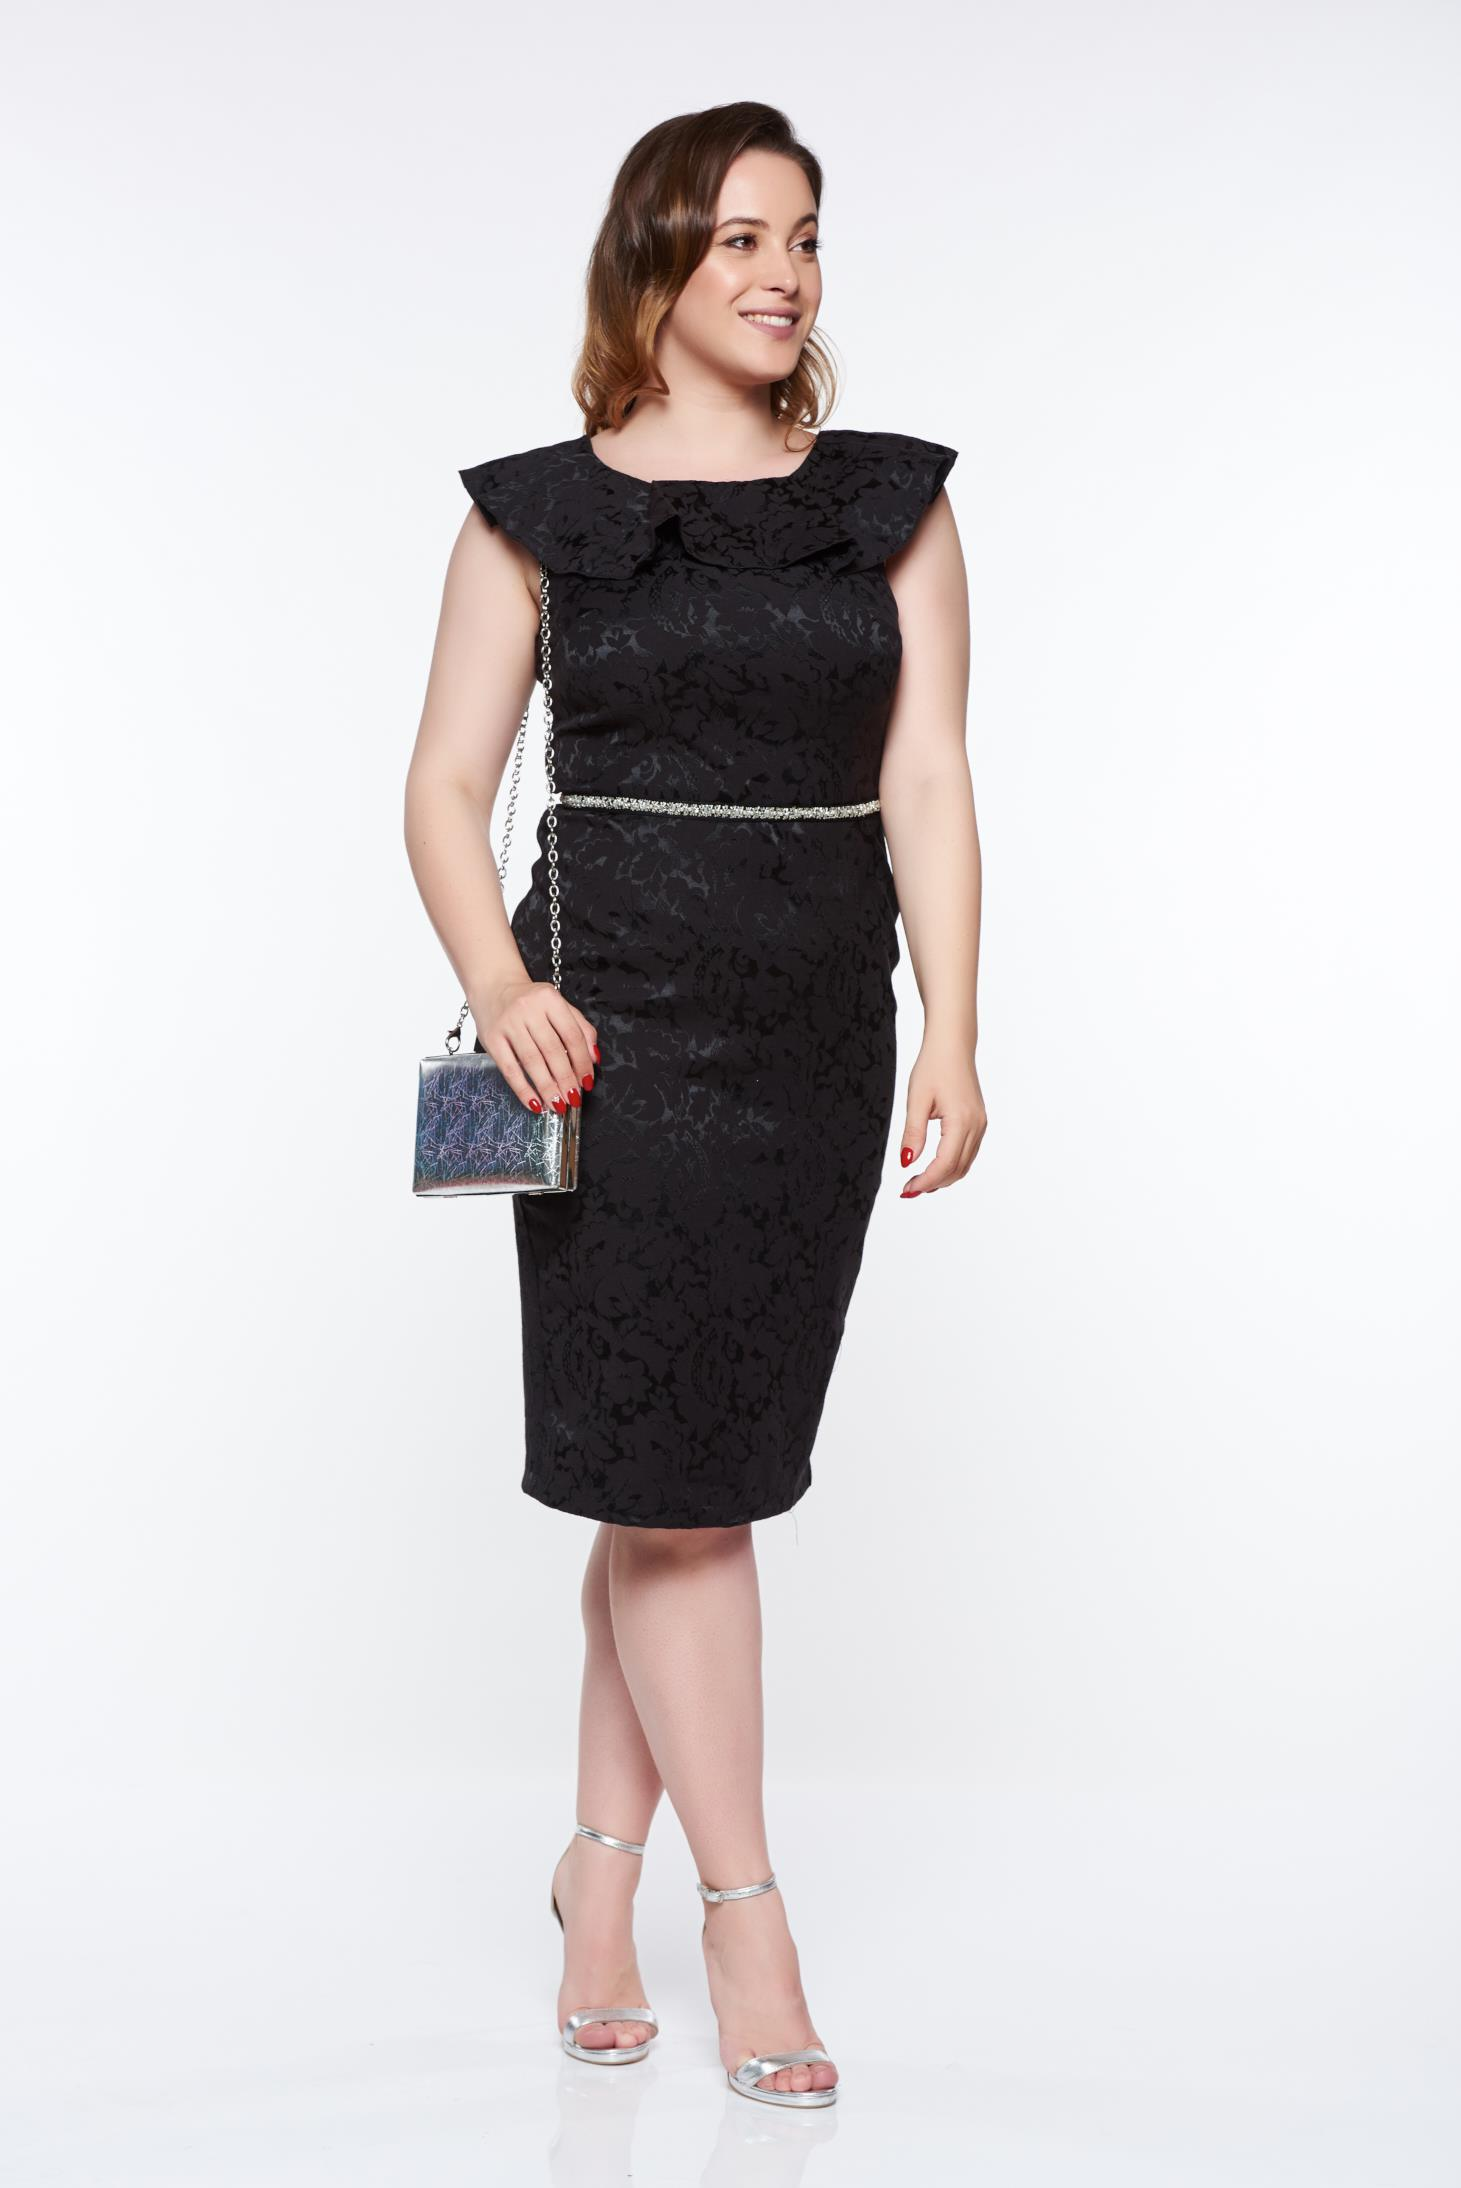 Rochie StarShinerS neagra eleganta tip creion din stofa cu spatele decupat cu volanase